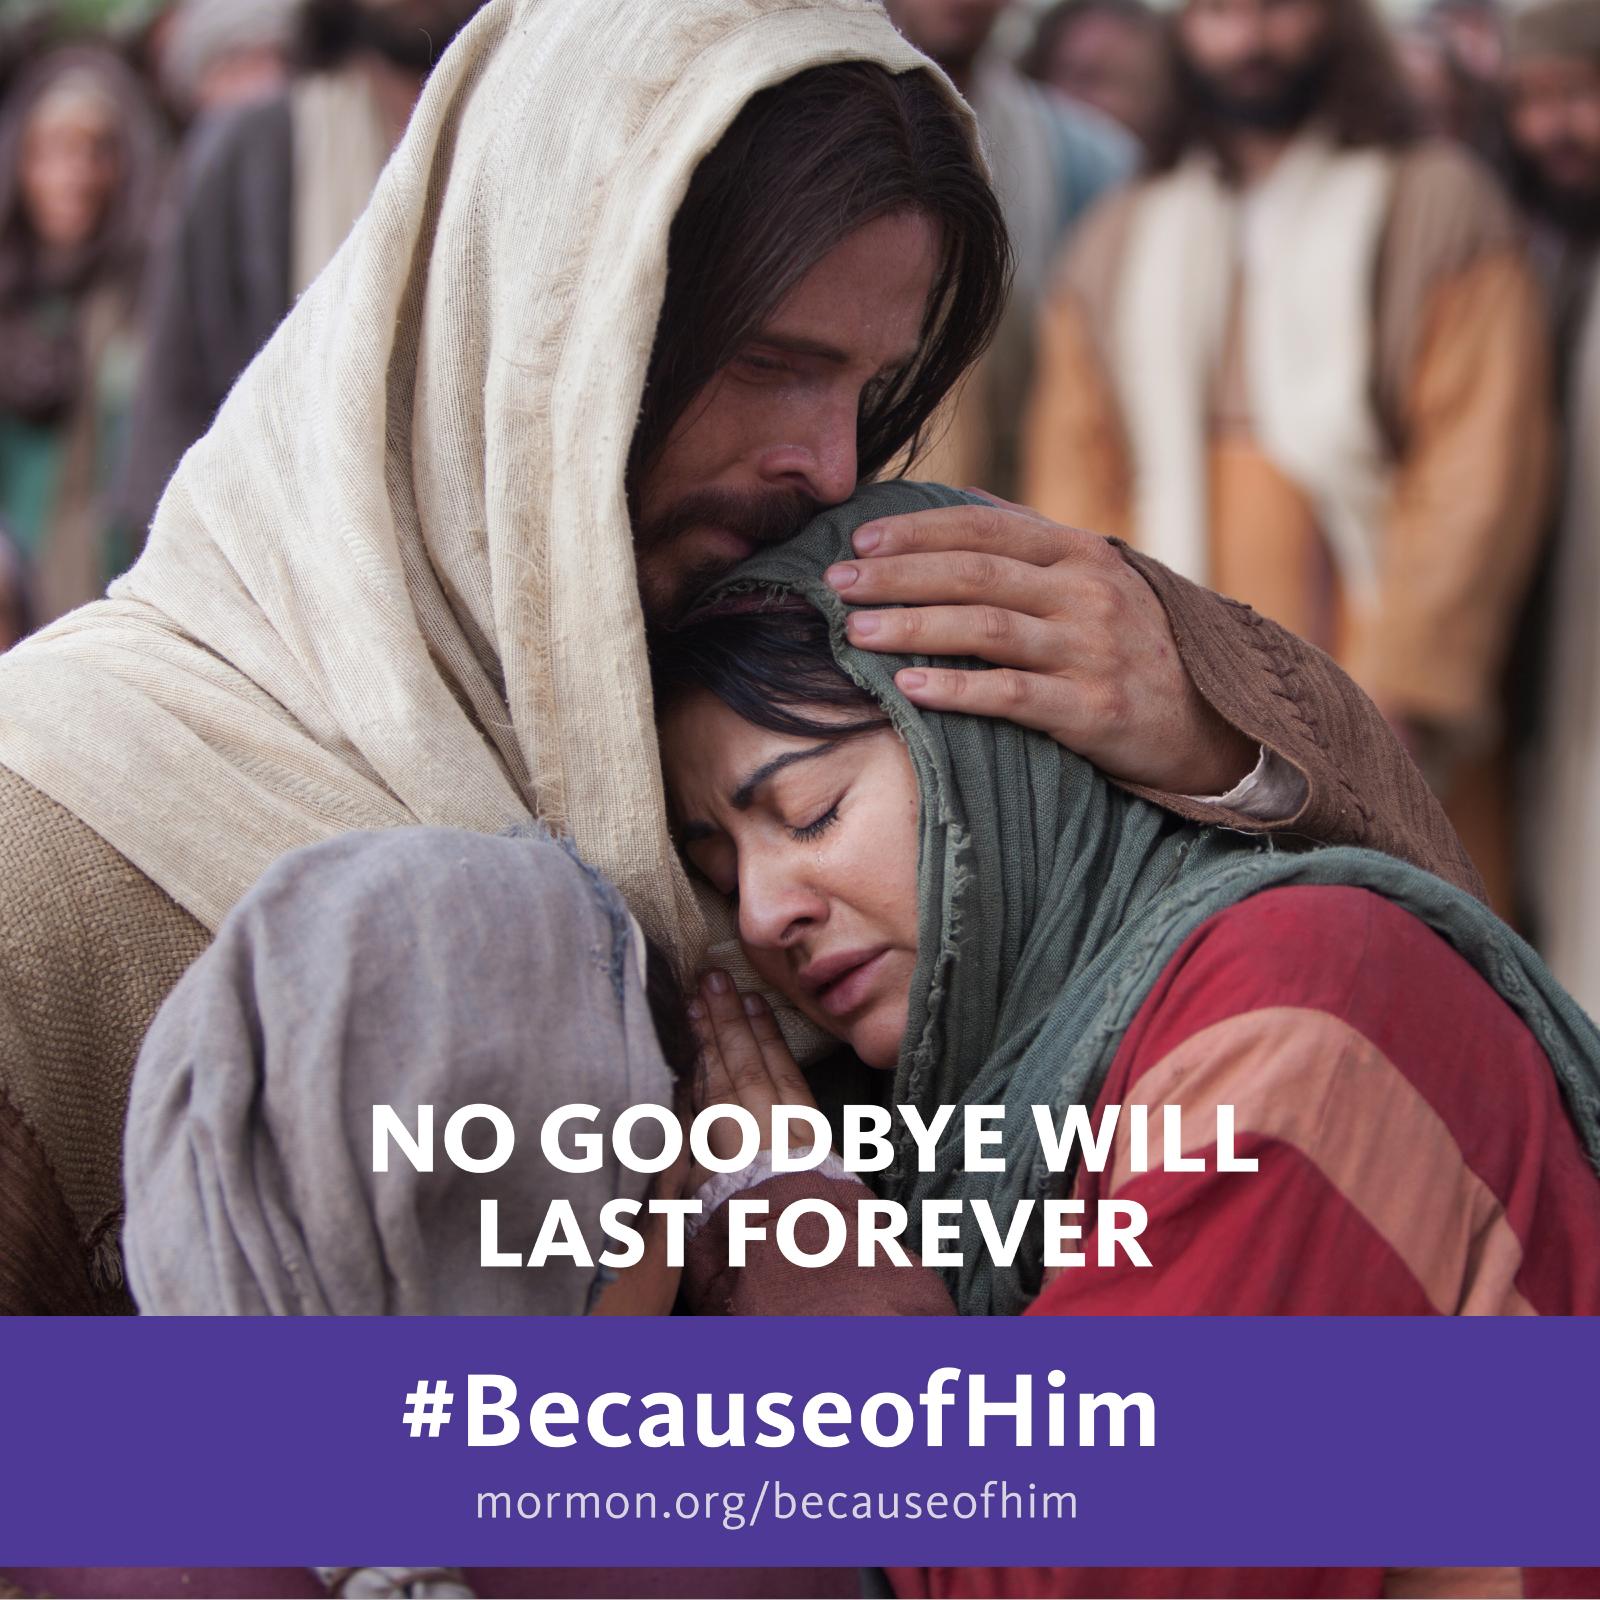 meme jesus goodbye 1242028 wallpaper?download=true no good bye will last forever